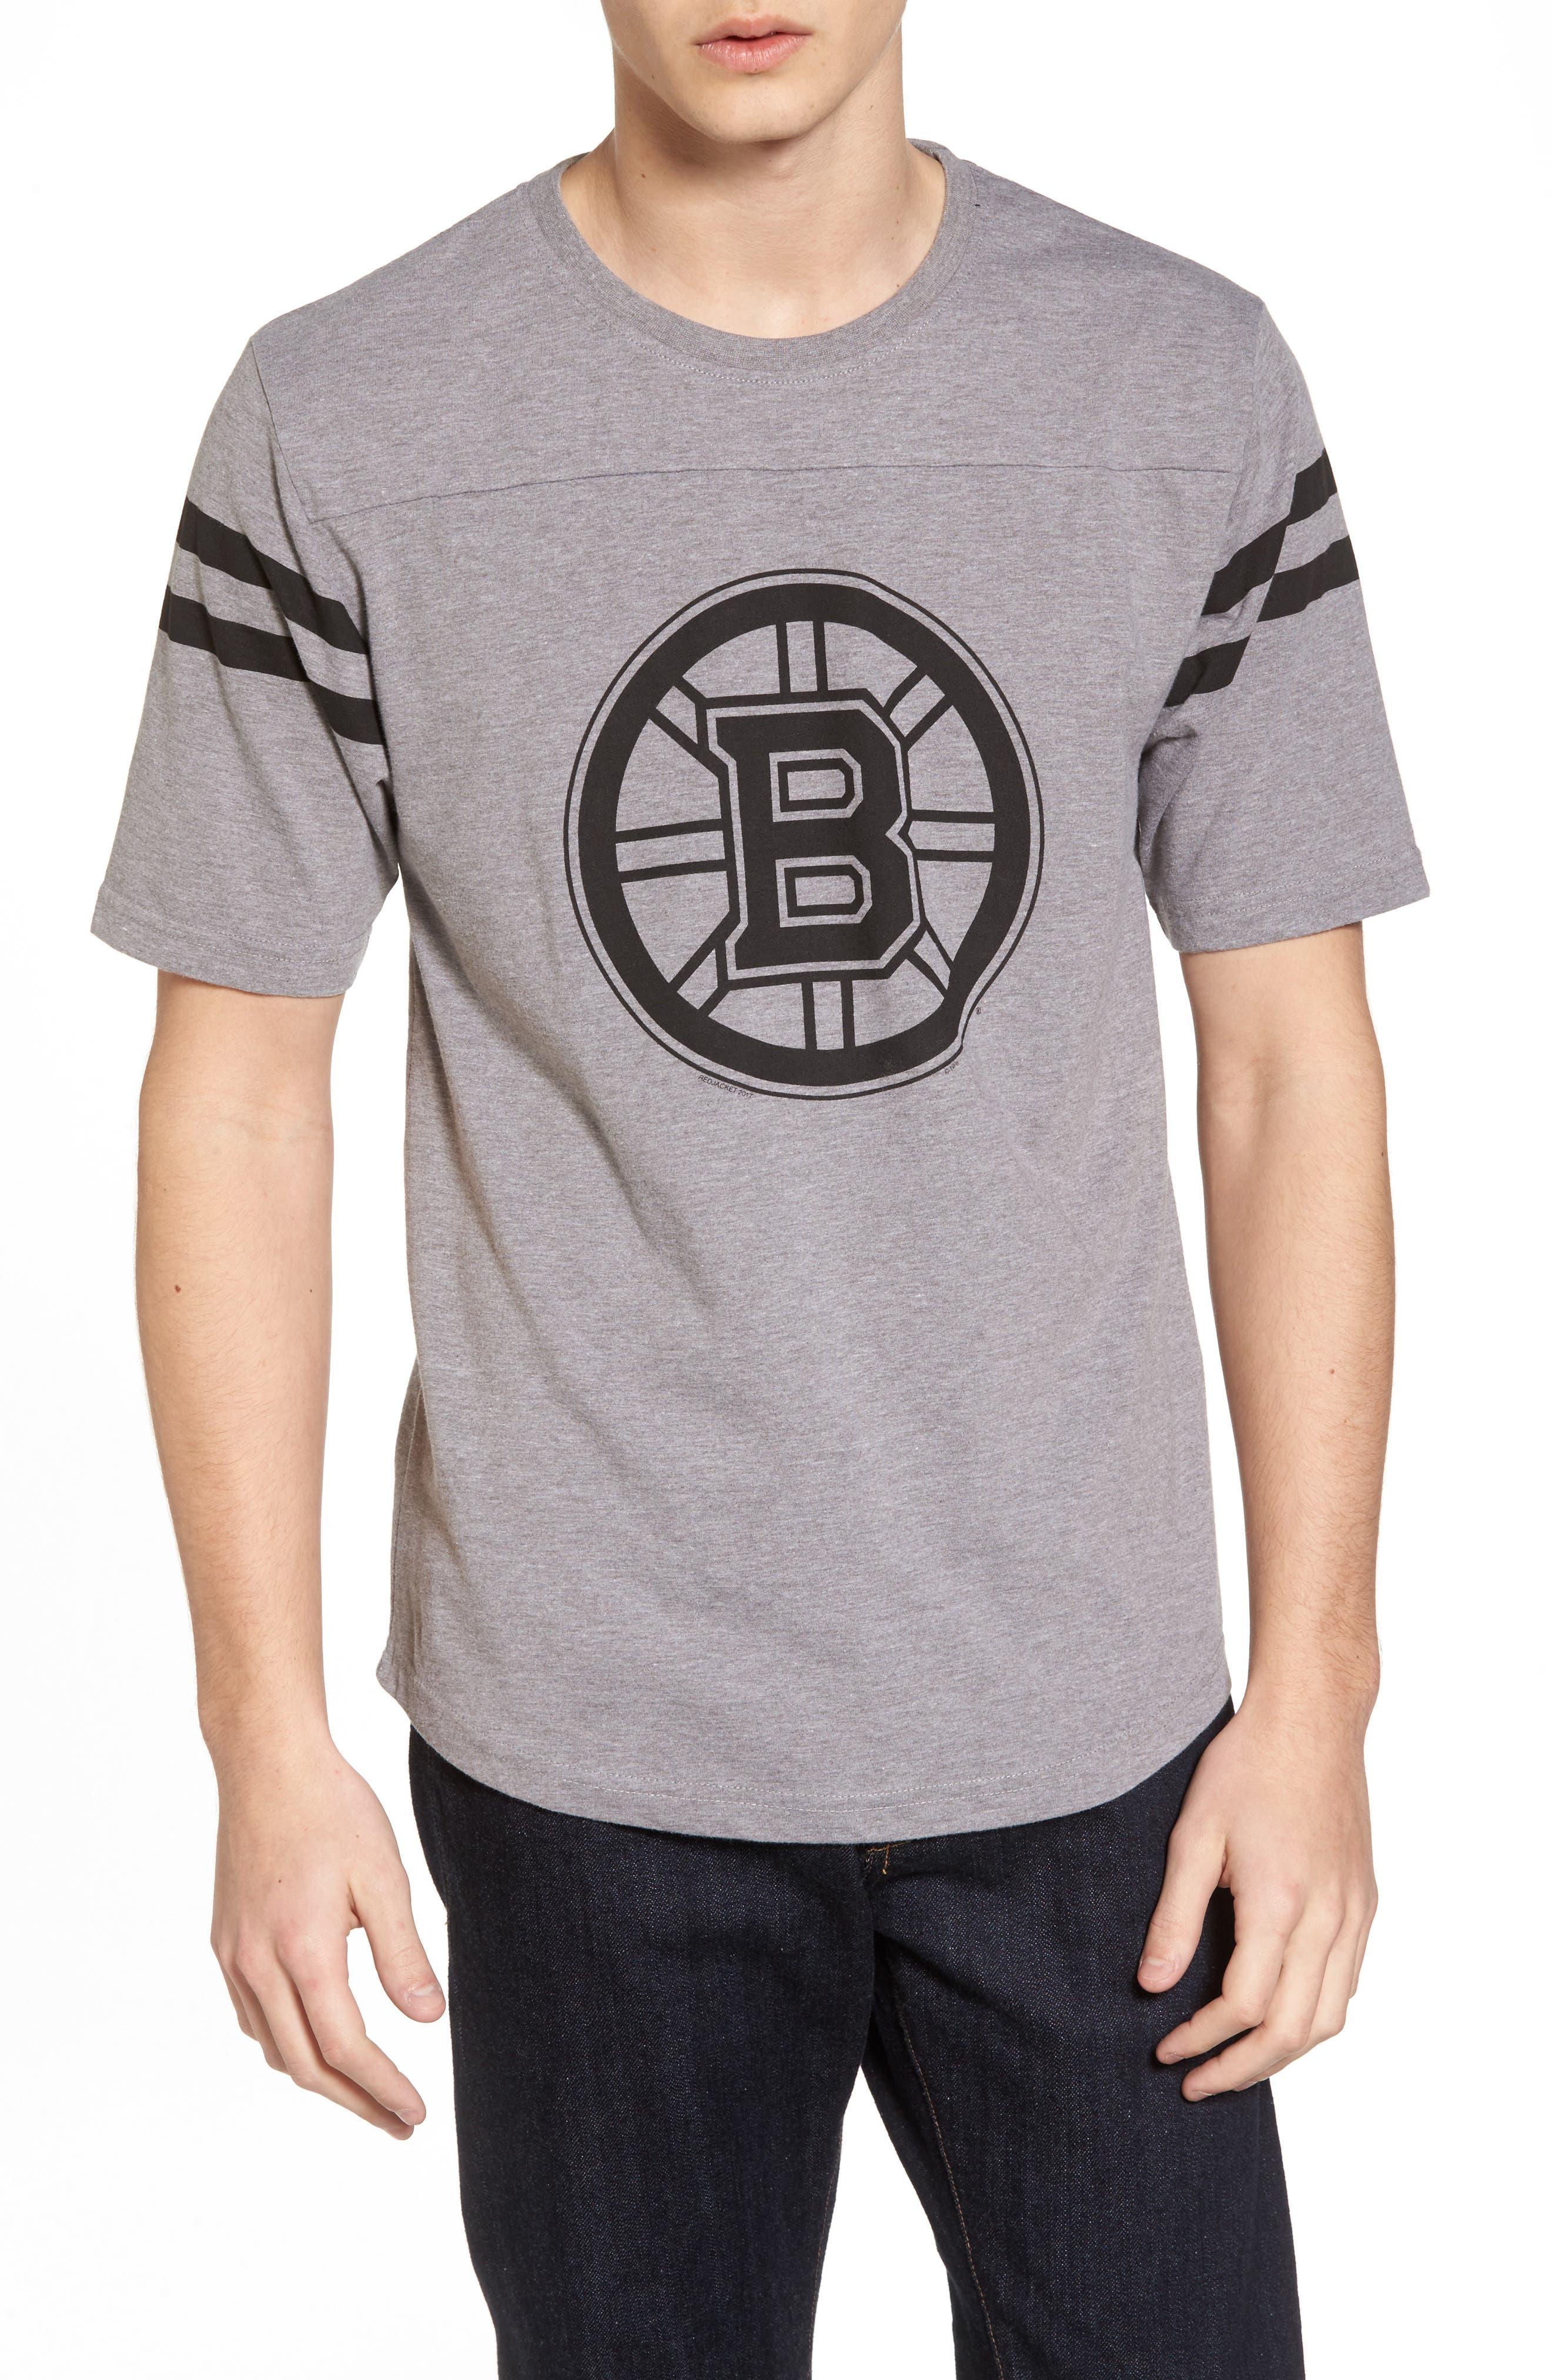 Crosby Boston Bruins T-Shirt,                         Main,                         color,